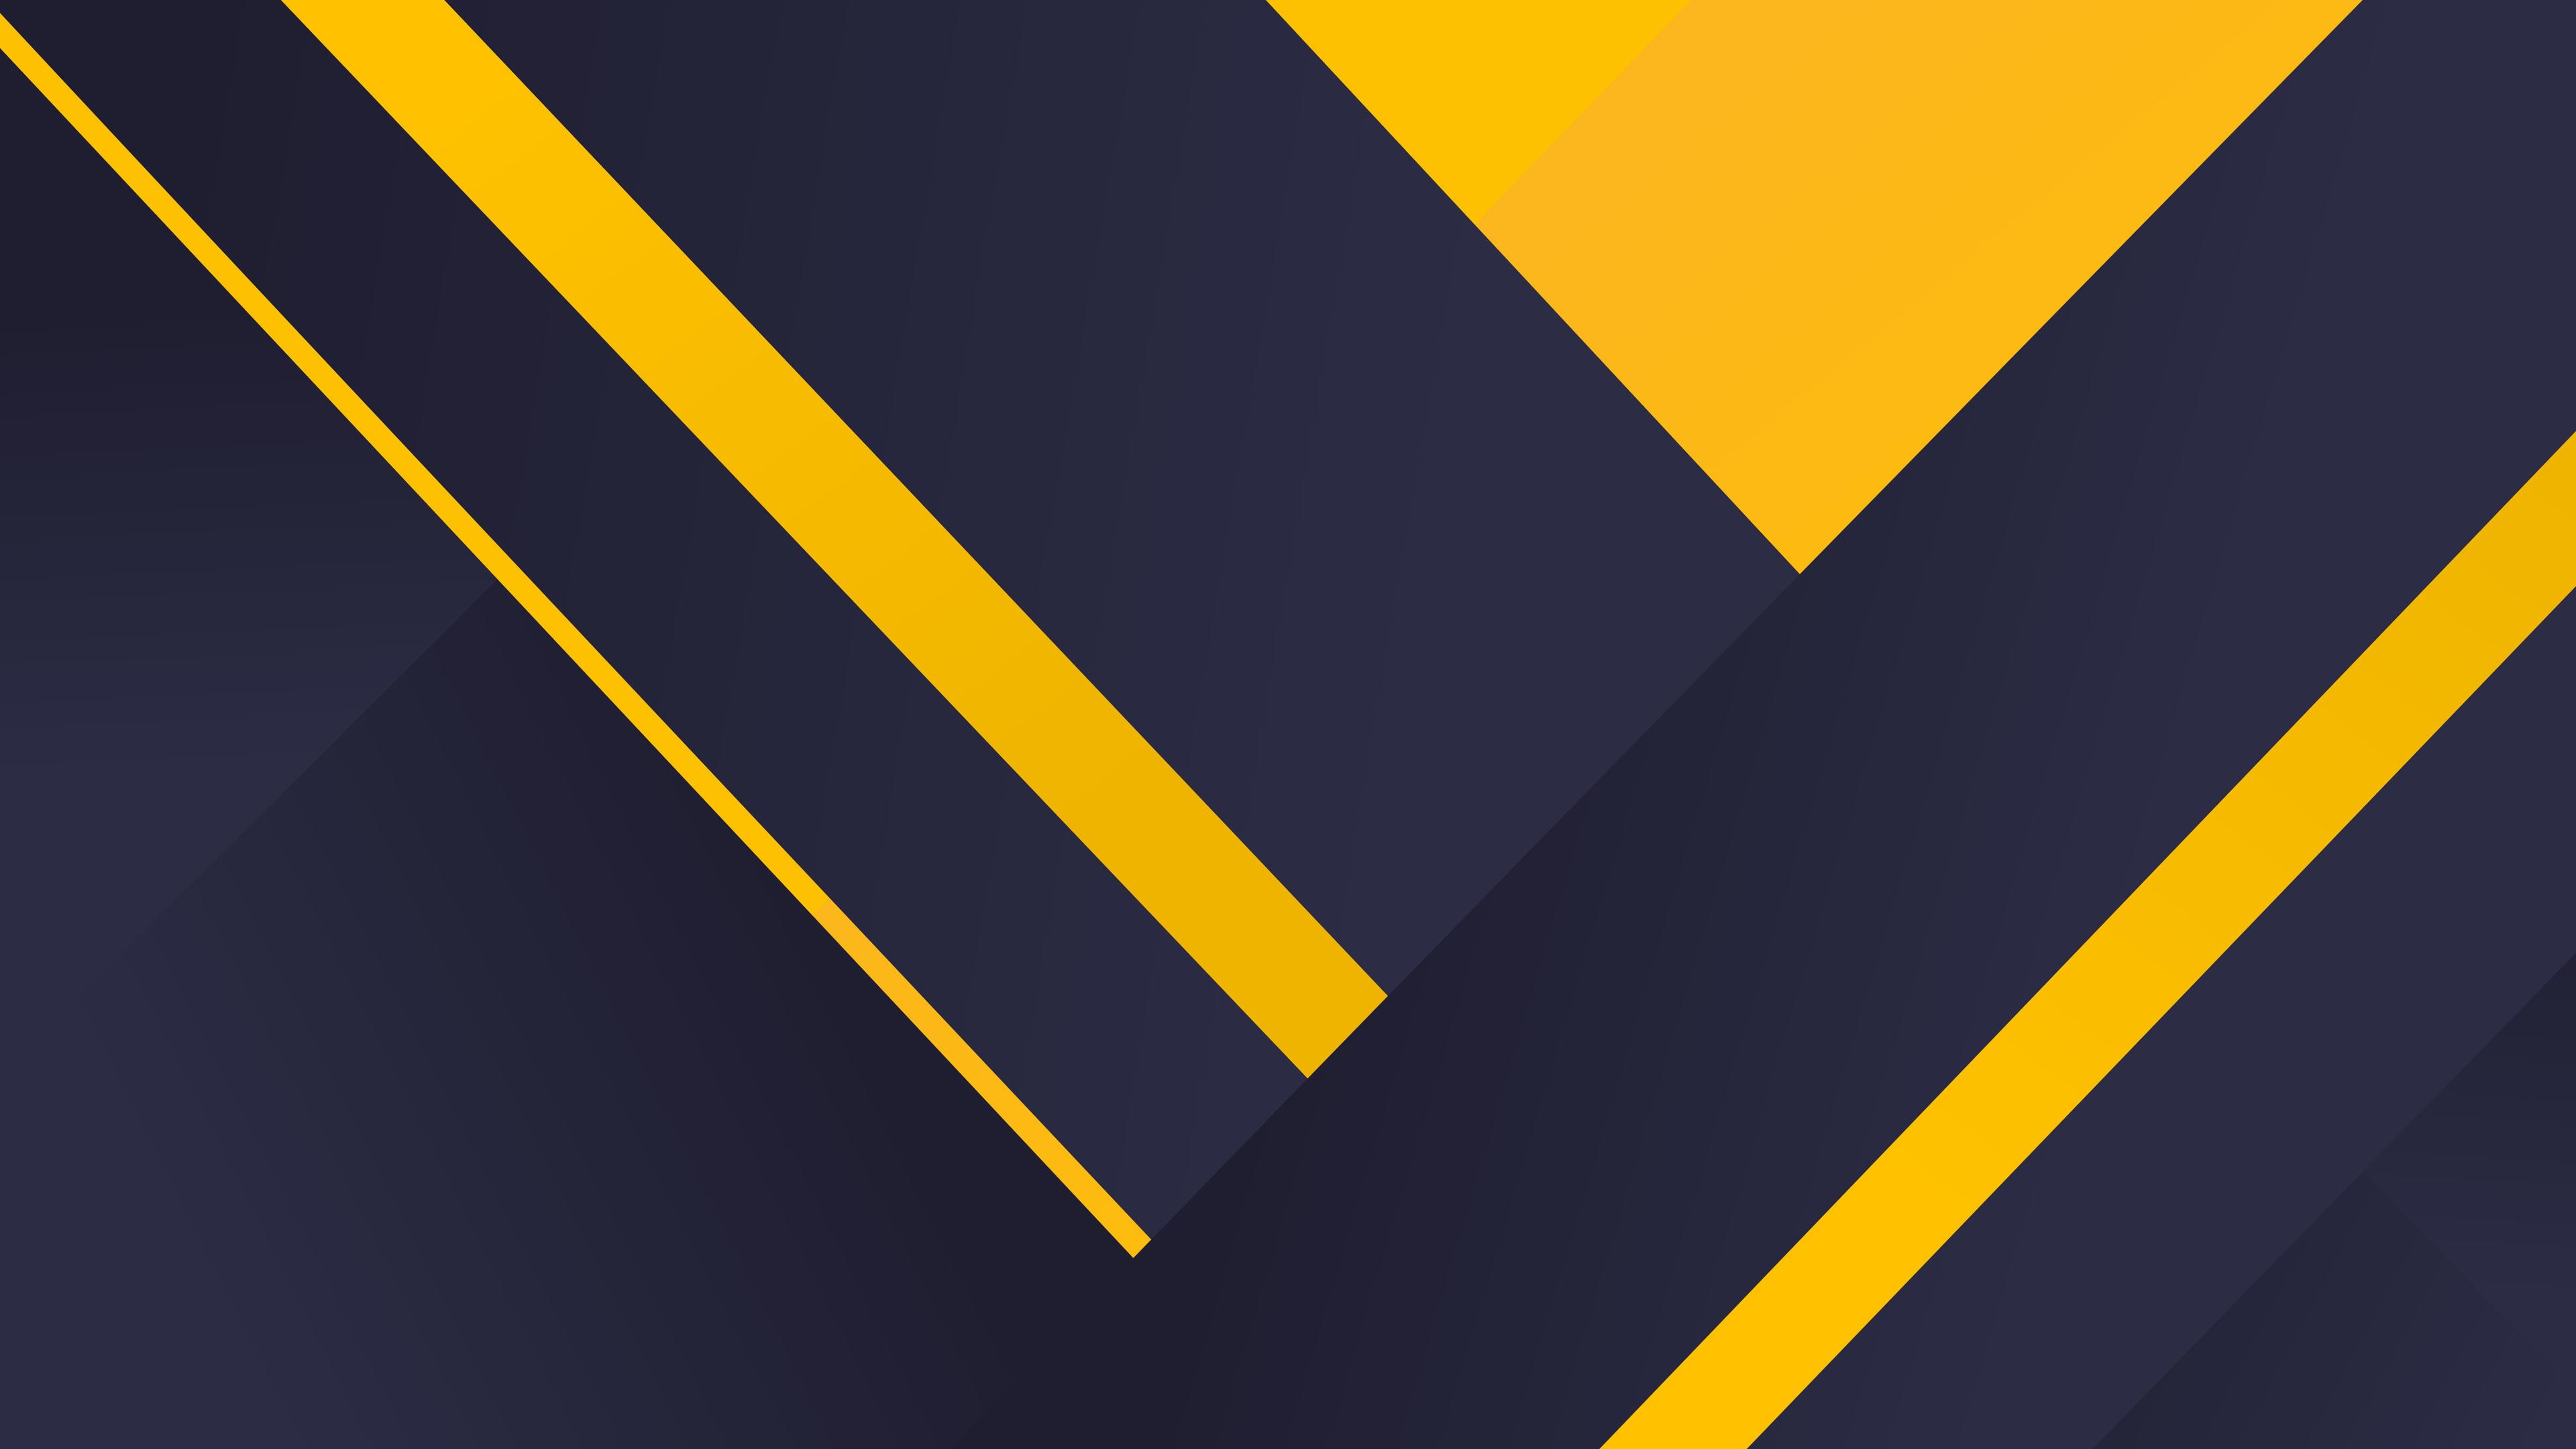 geometric material yellow blue 4k 1539371362 - Geometric Material Yellow Blue 4k - yellow wallpapers, material wallpapers, hd-wallpapers, geometry wallpapers, digital art wallpapers, design wallpapers, blue wallpapers, behance wallpapers, artwork wallpapers, artist wallpapers, abstract wallpapers, 5k wallpapers, 4k-wallpapers